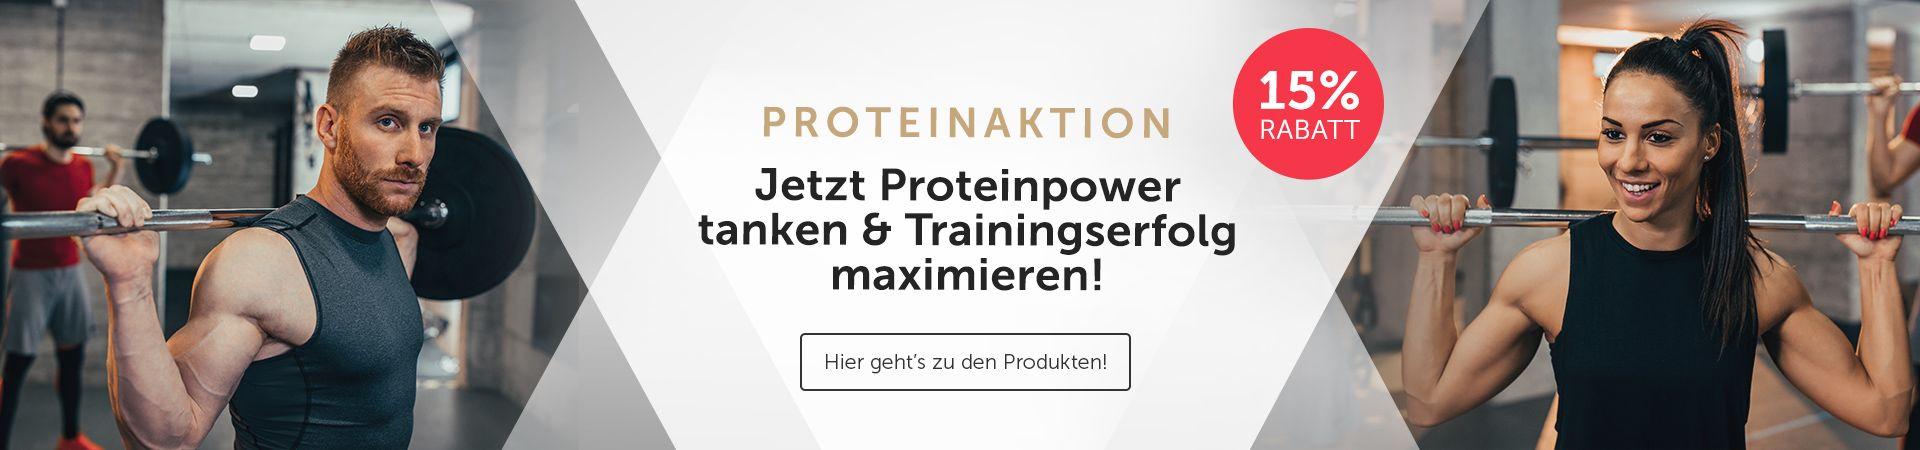 20181115_Proteinaktion_15proz